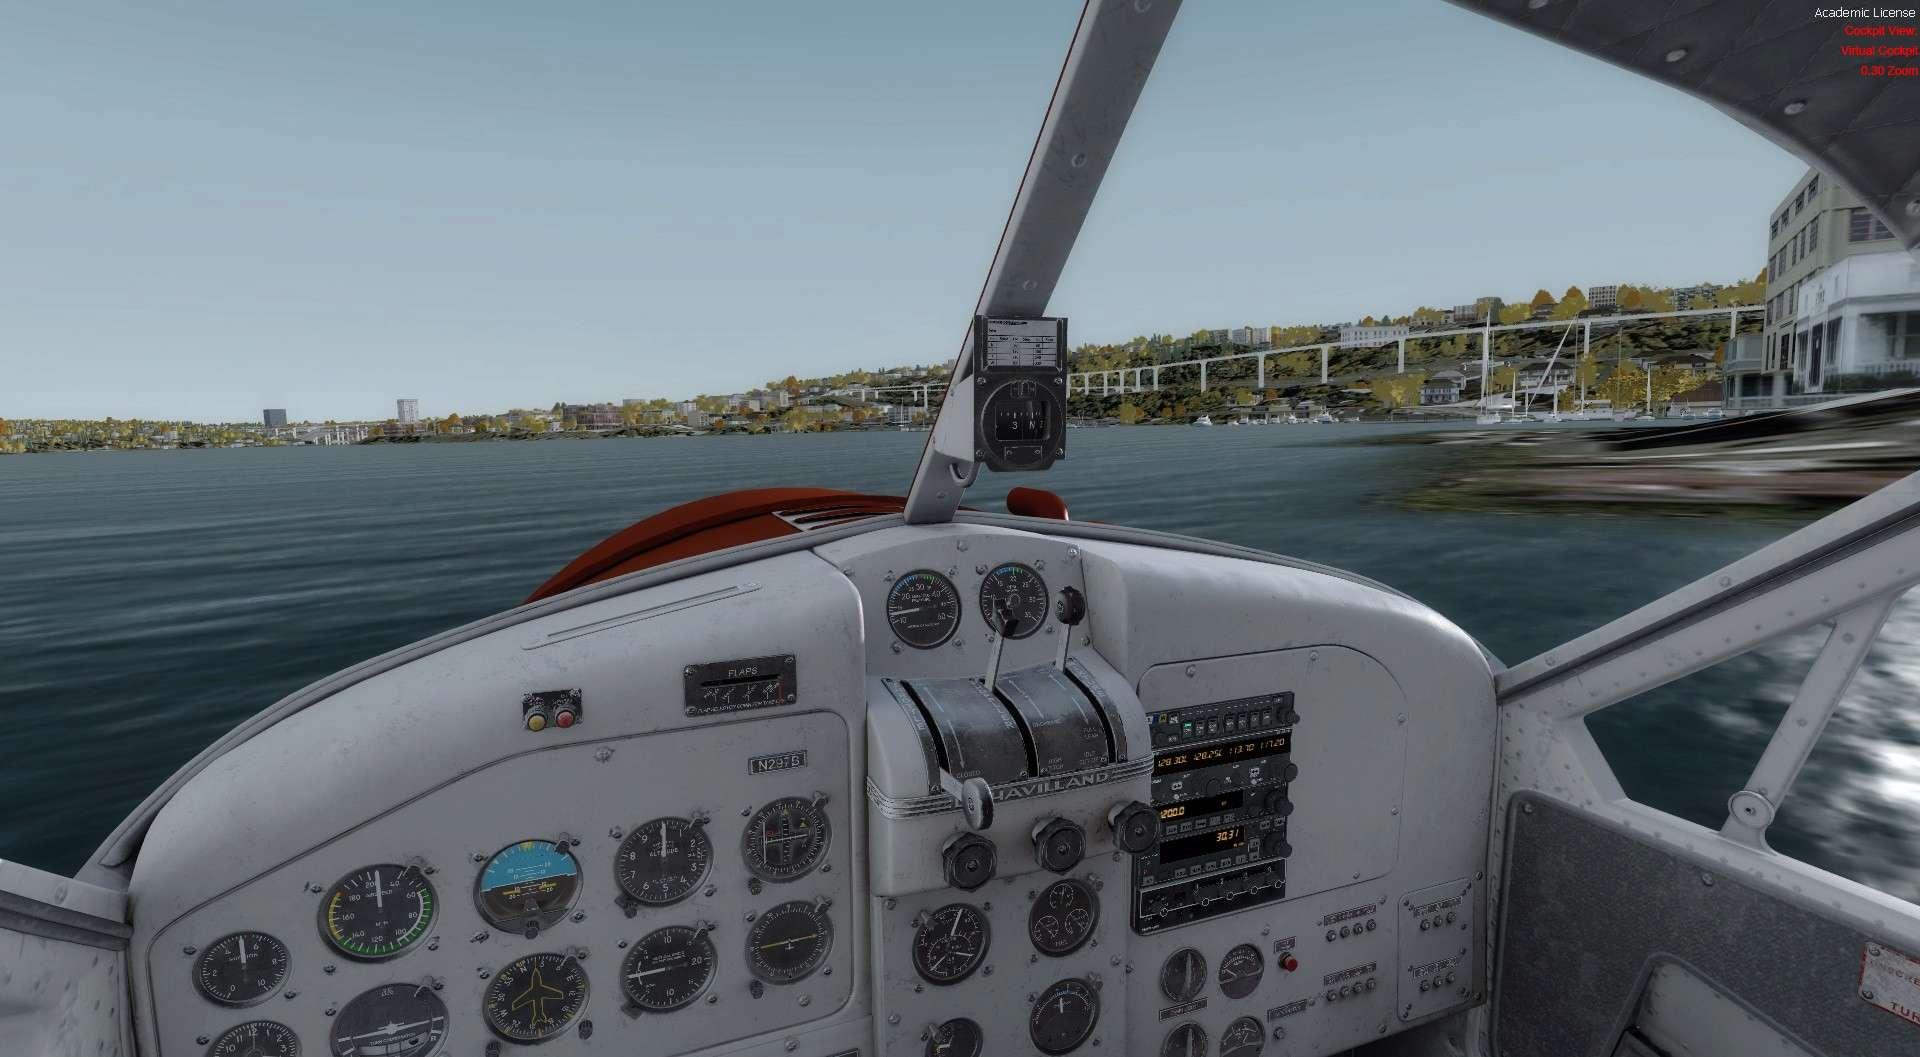 Compte rendu du vol Kenmore Air Harbor (W55) à Kenmore Air Harbor (W55) 2017-125